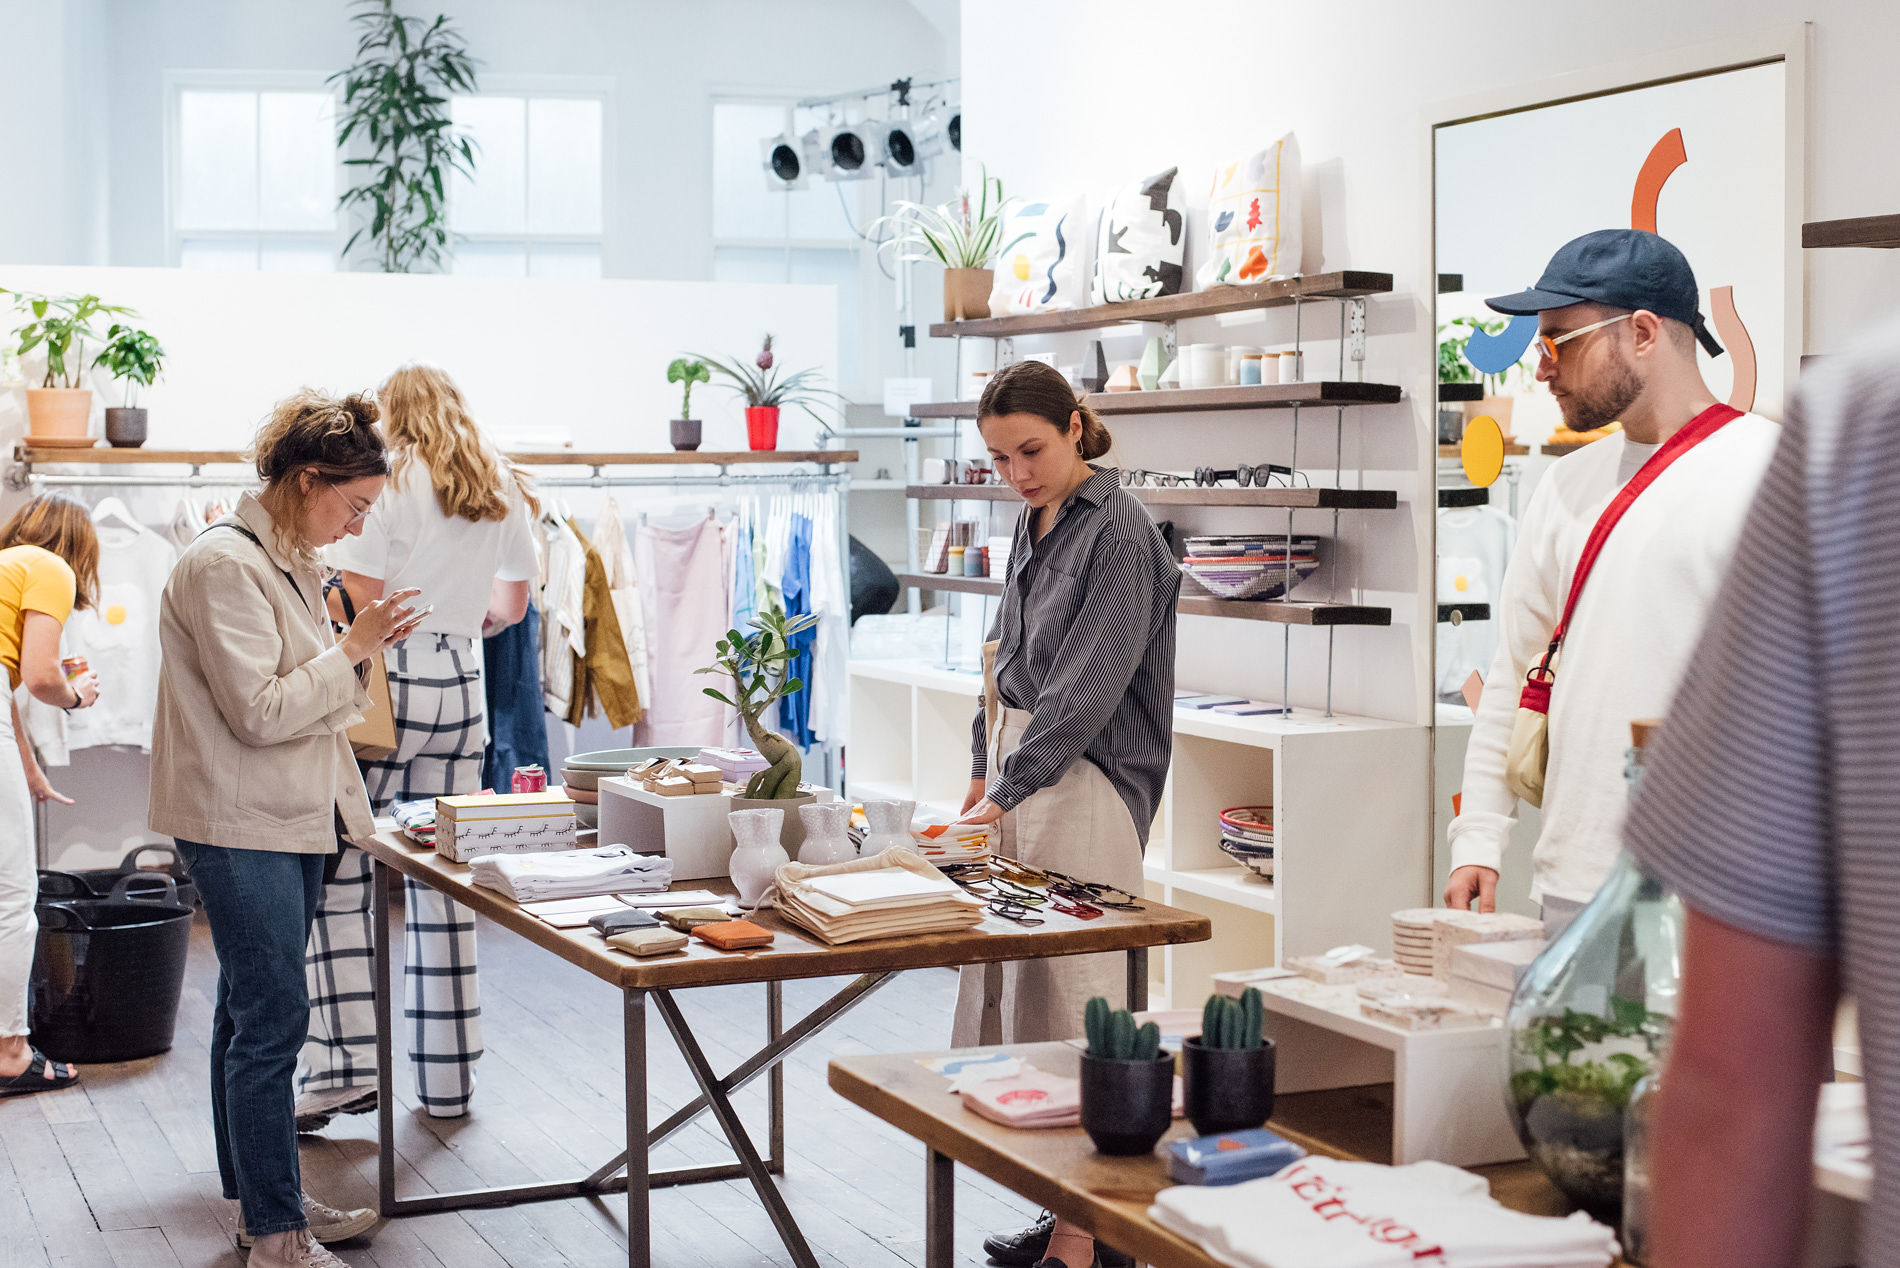 PopIN-Shop-Shoreditch-WeekendIN-May-2019-Web-146.jpg